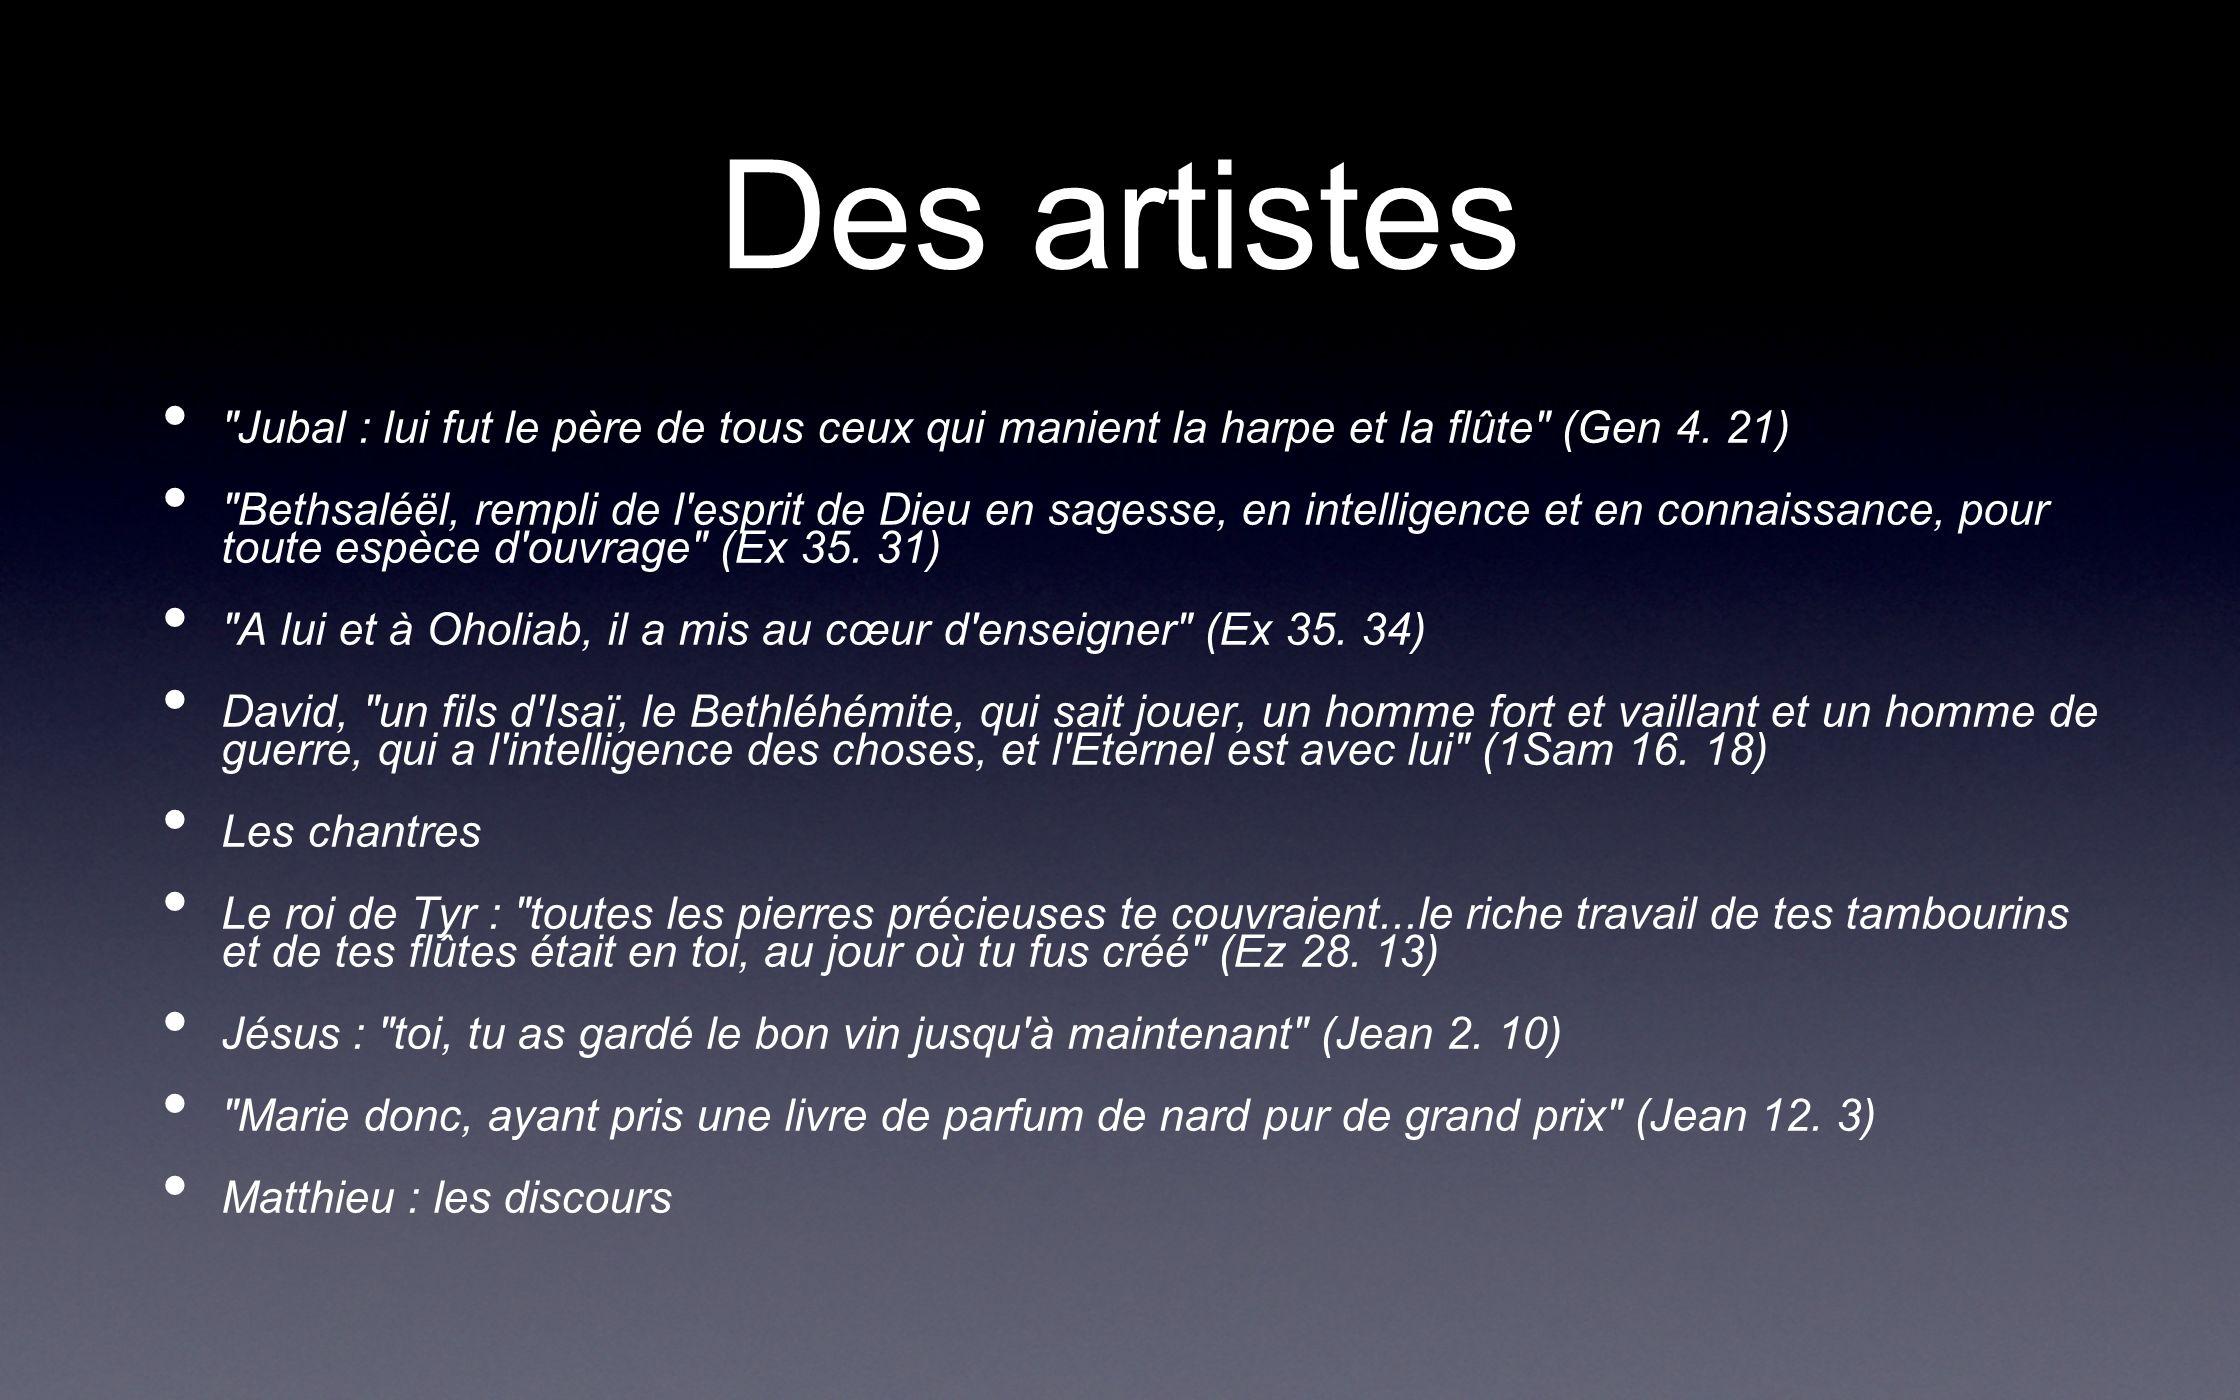 Des artistes